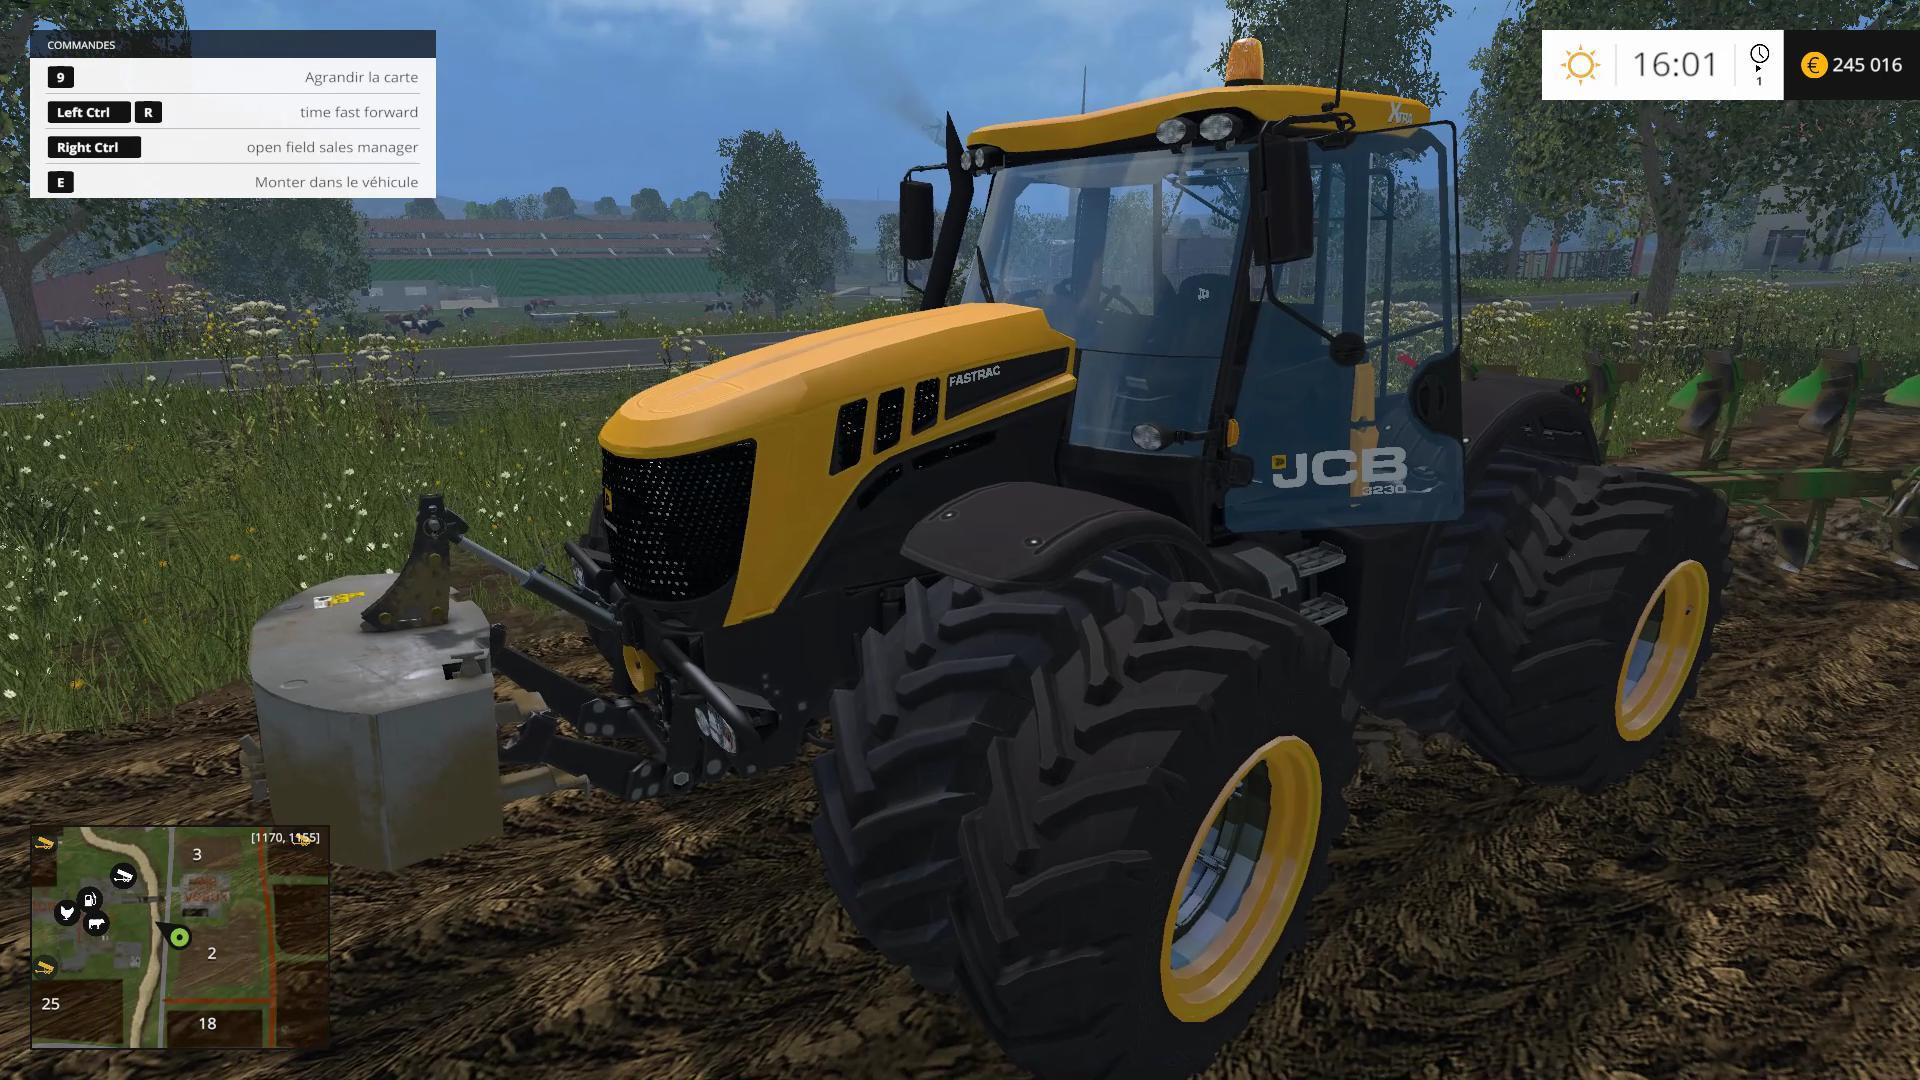 JCB FASTRAC 3220 V1 TRACTOR - Farming simulator 2019 / 2017 / 2015 Mod